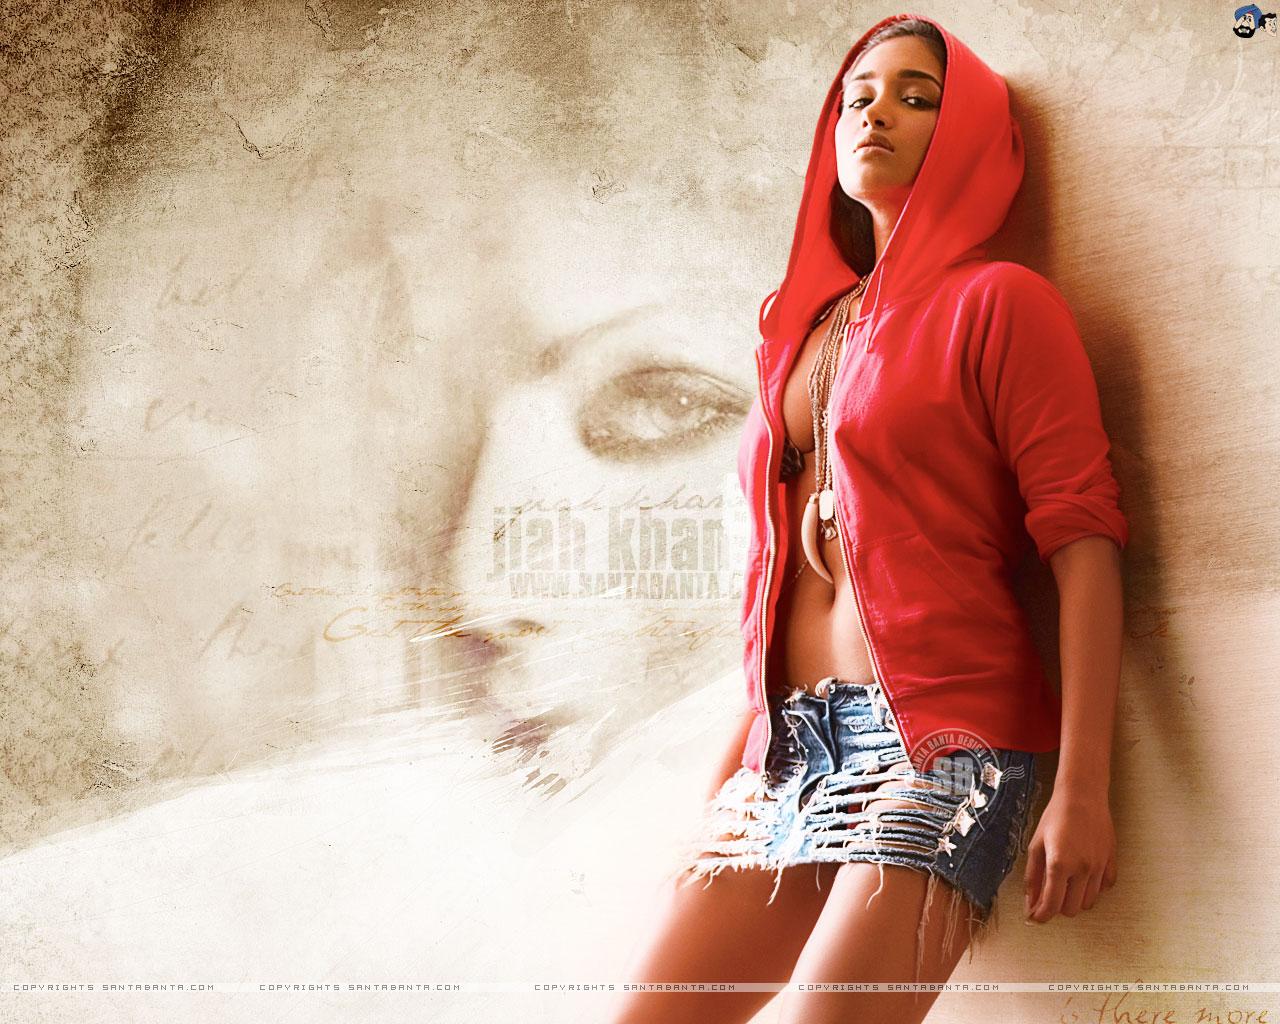 http://2.bp.blogspot.com/-MfUFJtV_TS8/TgdbgOySB8I/AAAAAAAAA28/FGpkK4u5VRY/s1600/Jia+Khan+Hot+Wallpapers2.jpg